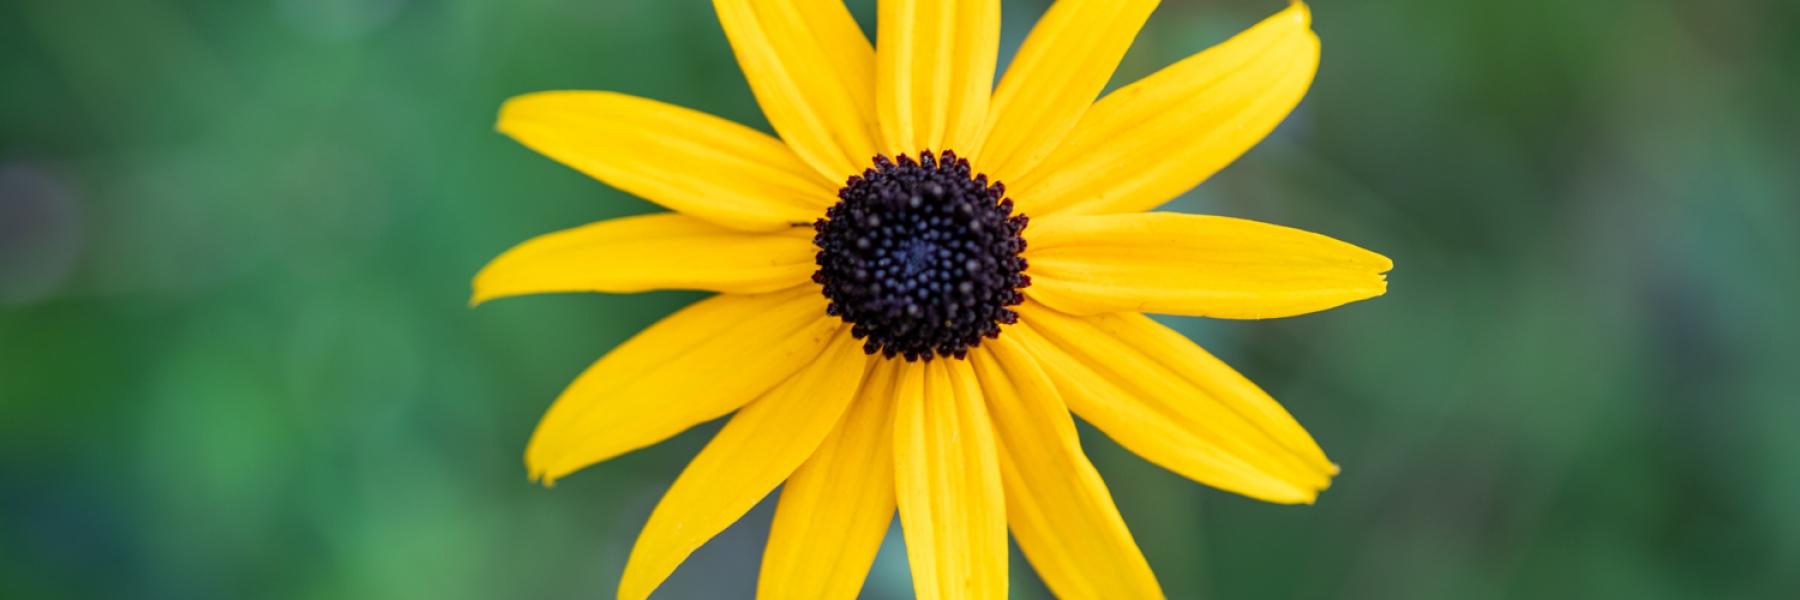 Image, Flower